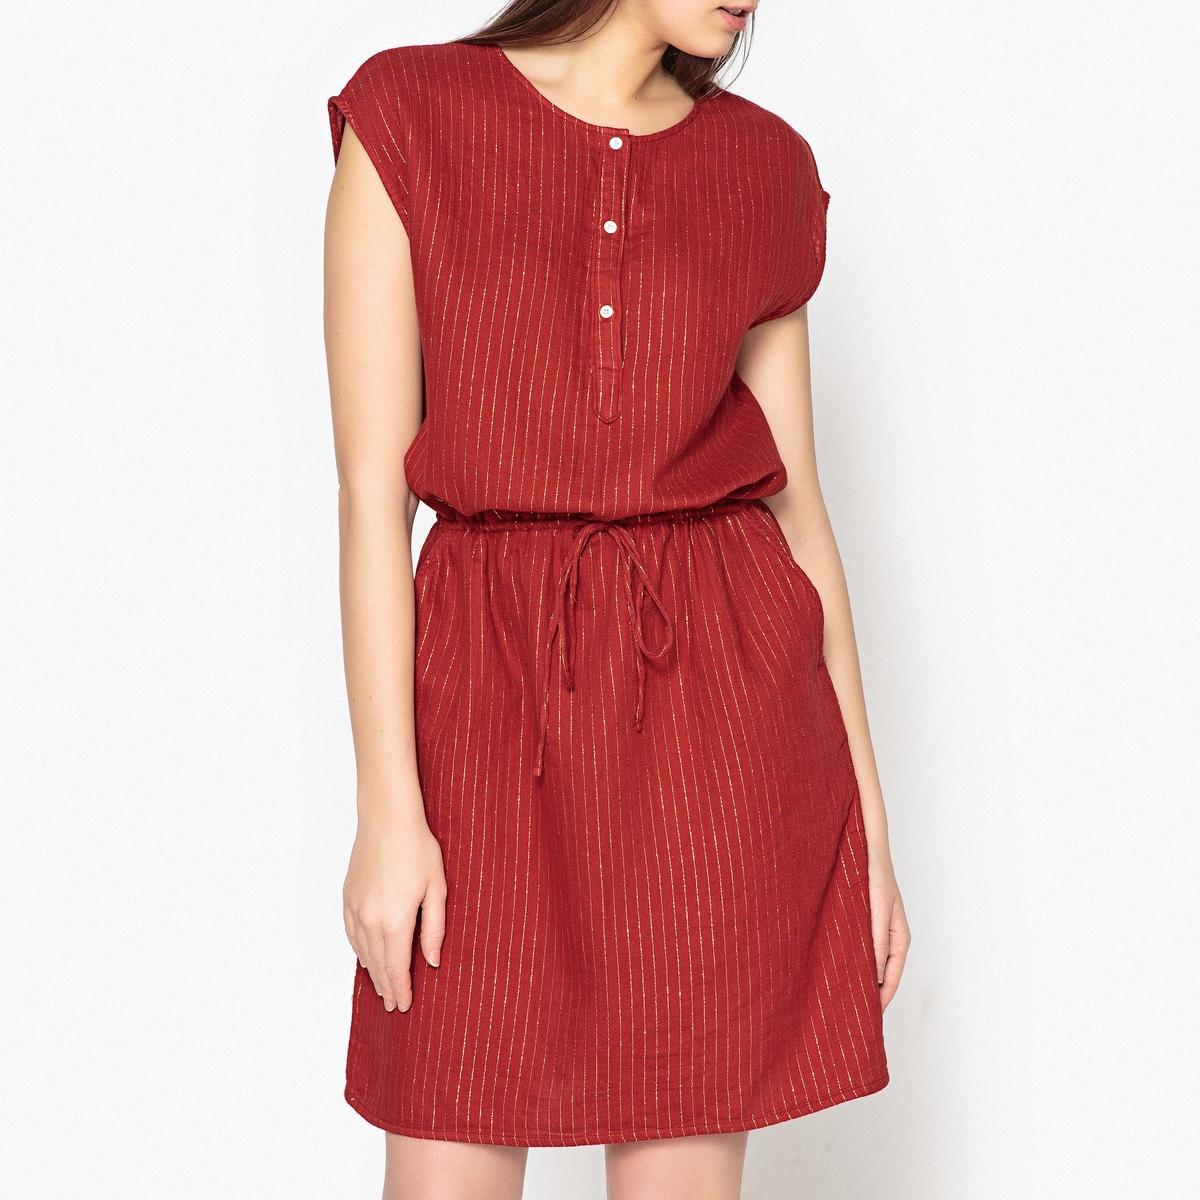 Платье HARTFORD 5481803 от LaRedoute